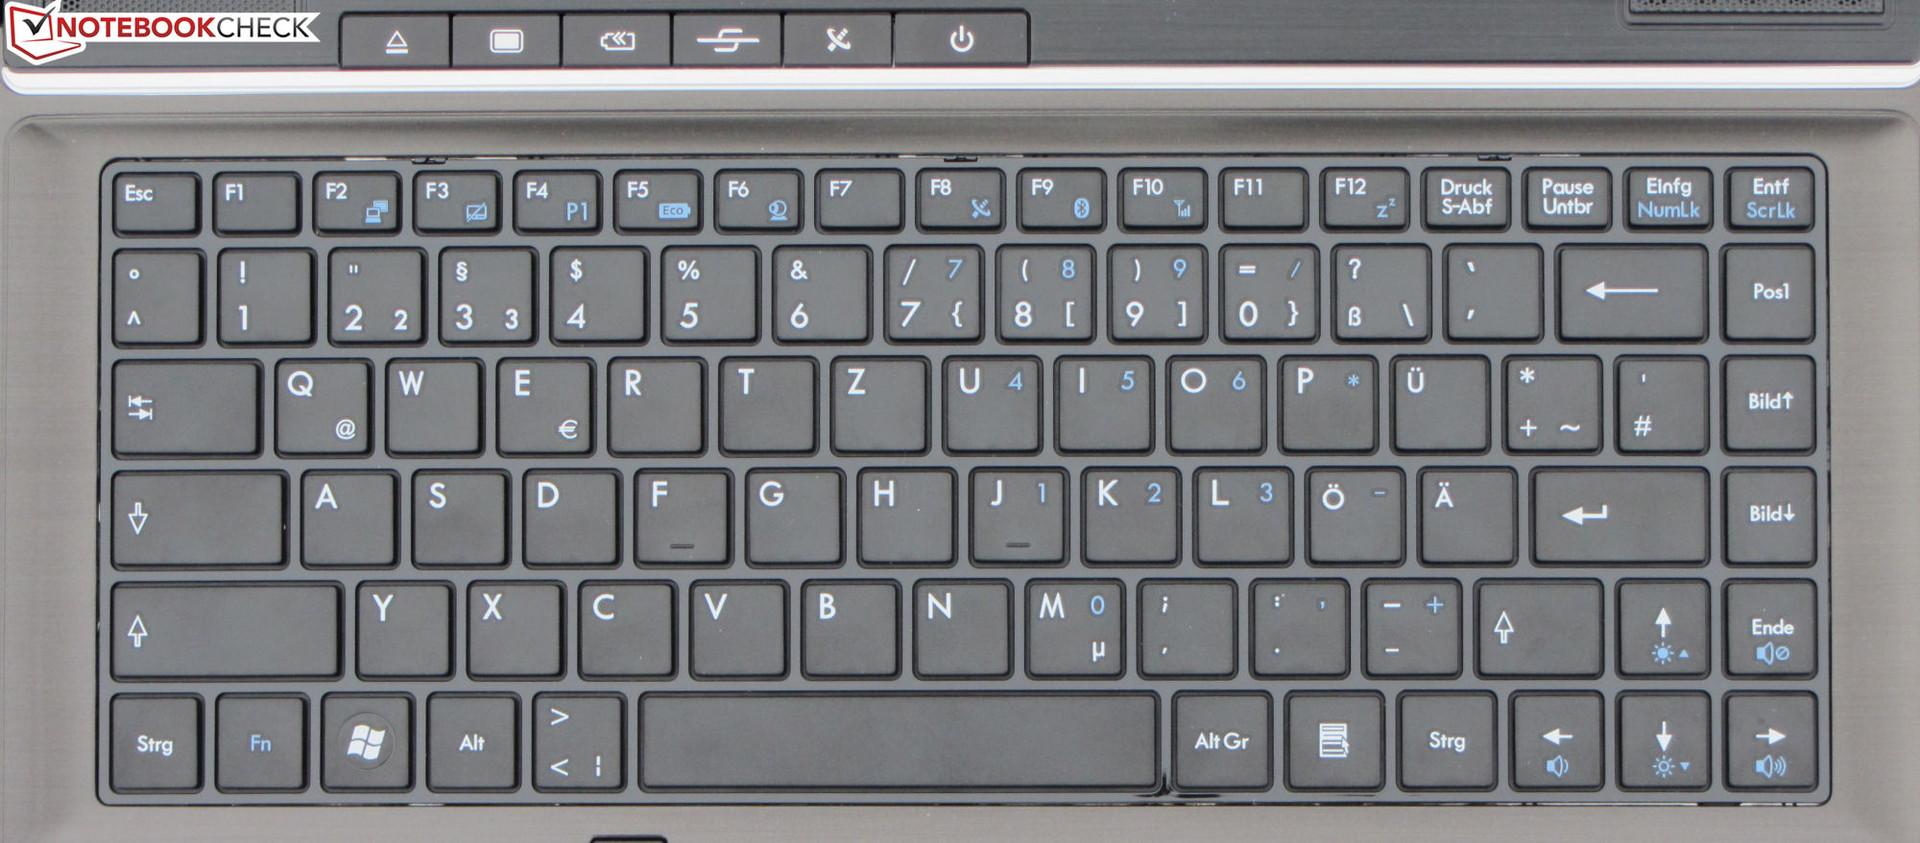 MSI CR43 6M Elantech Touchpad Drivers for Windows Mac